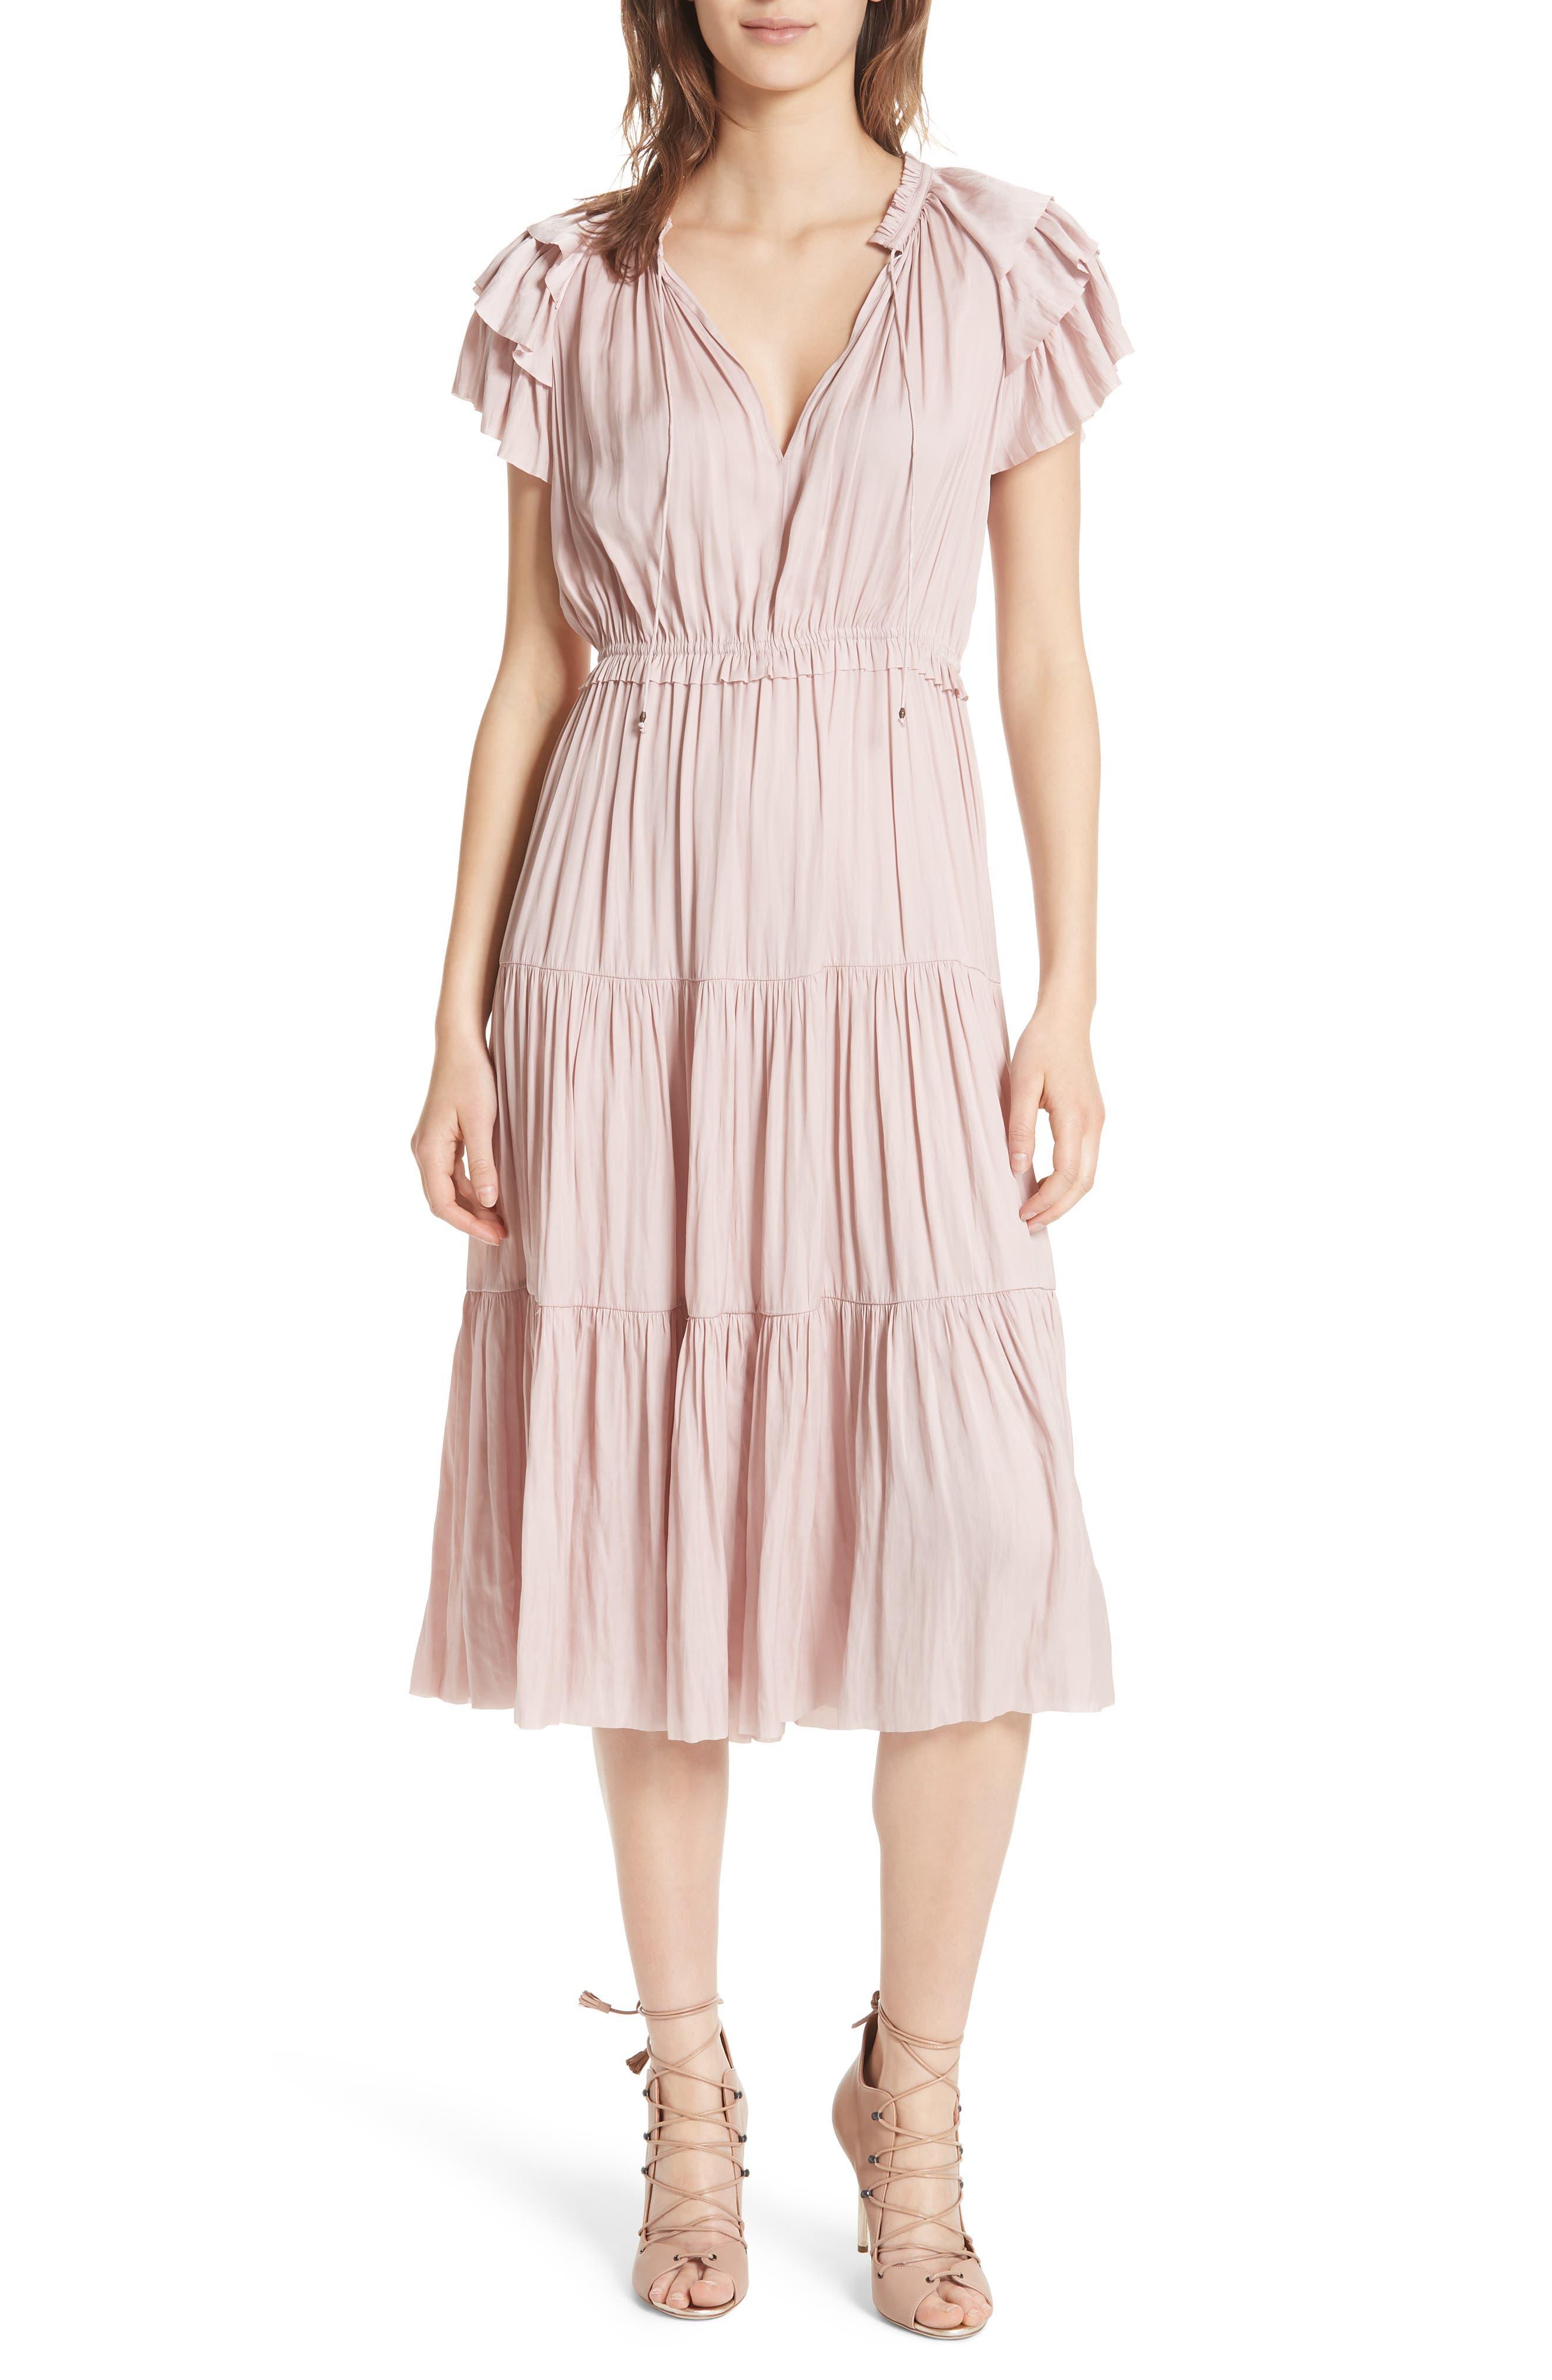 ULLA JOHNSON,                             Blaire Satin Dress,                             Main thumbnail 1, color,                             600